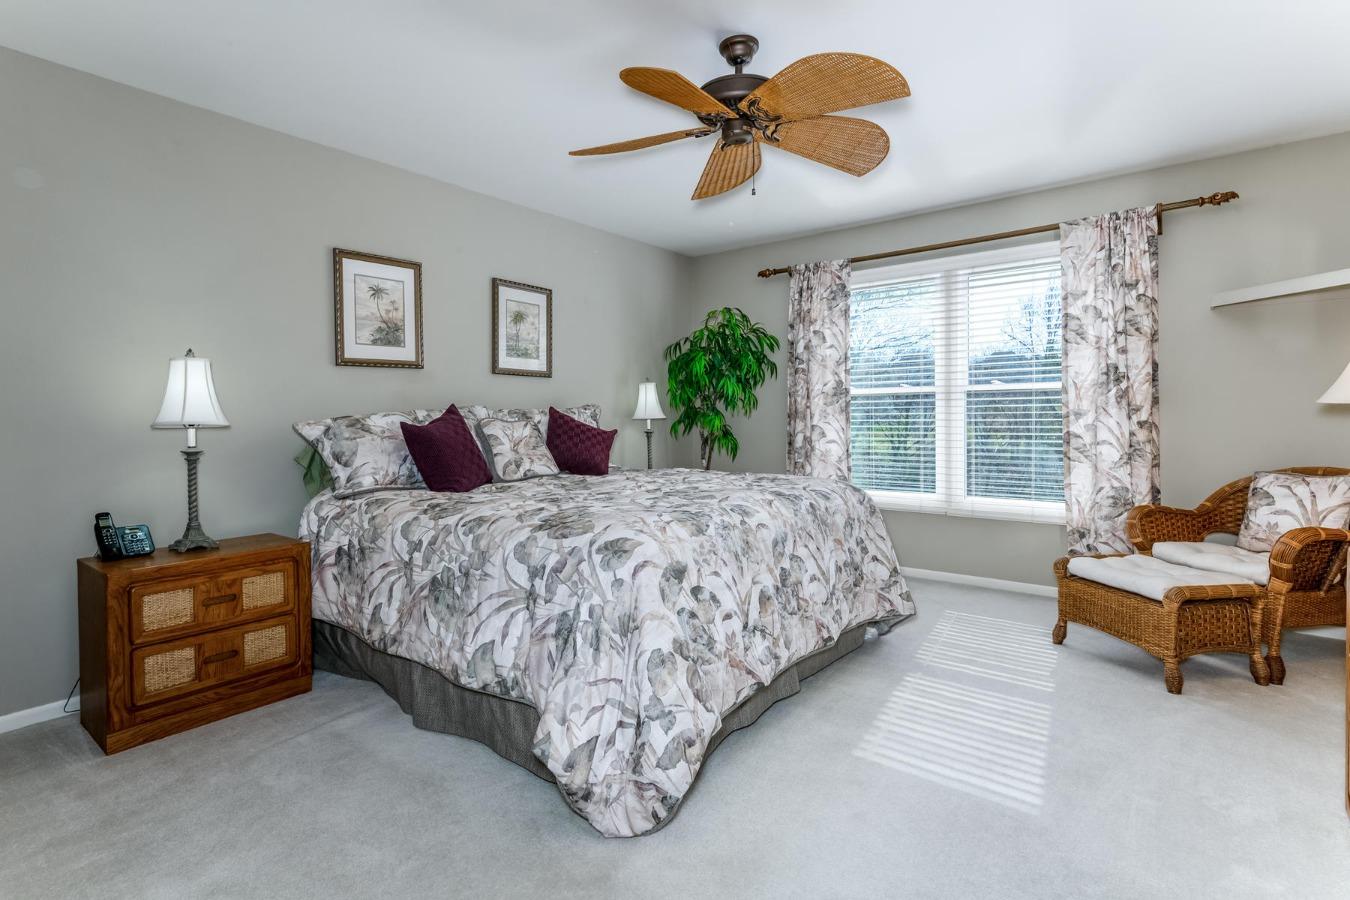 Large Main Floor Master Suite with Views Behind